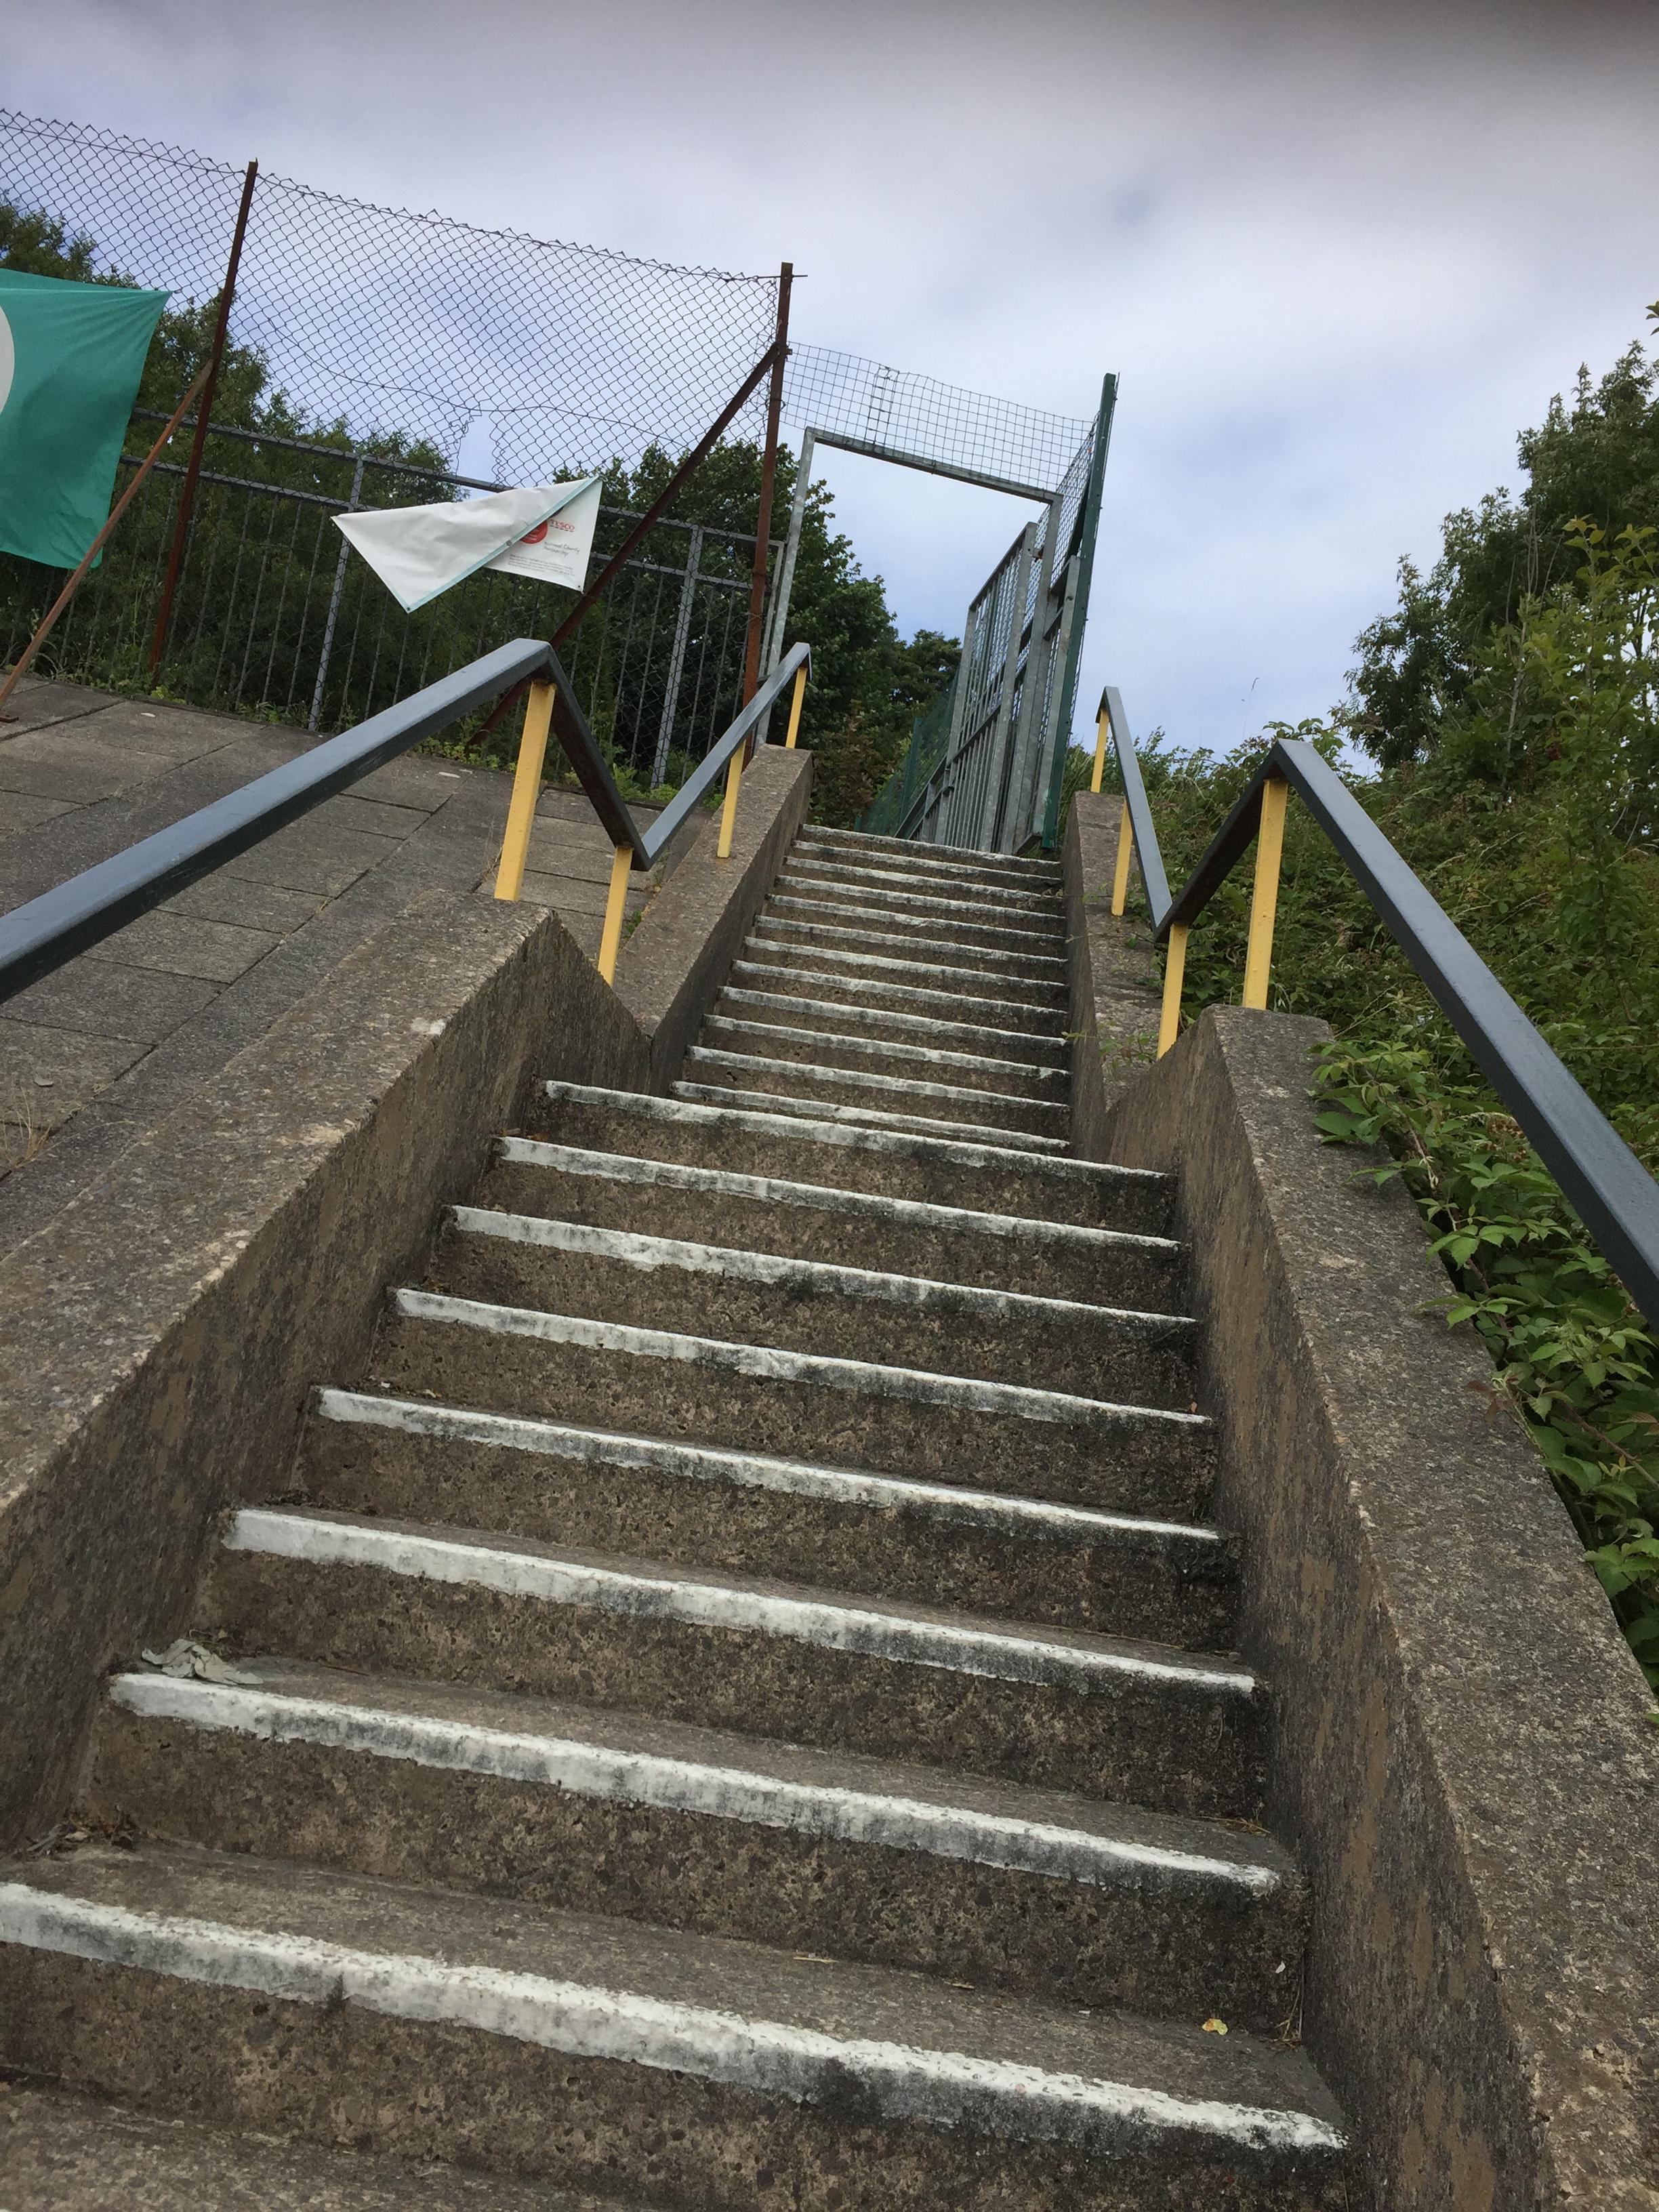 School steps